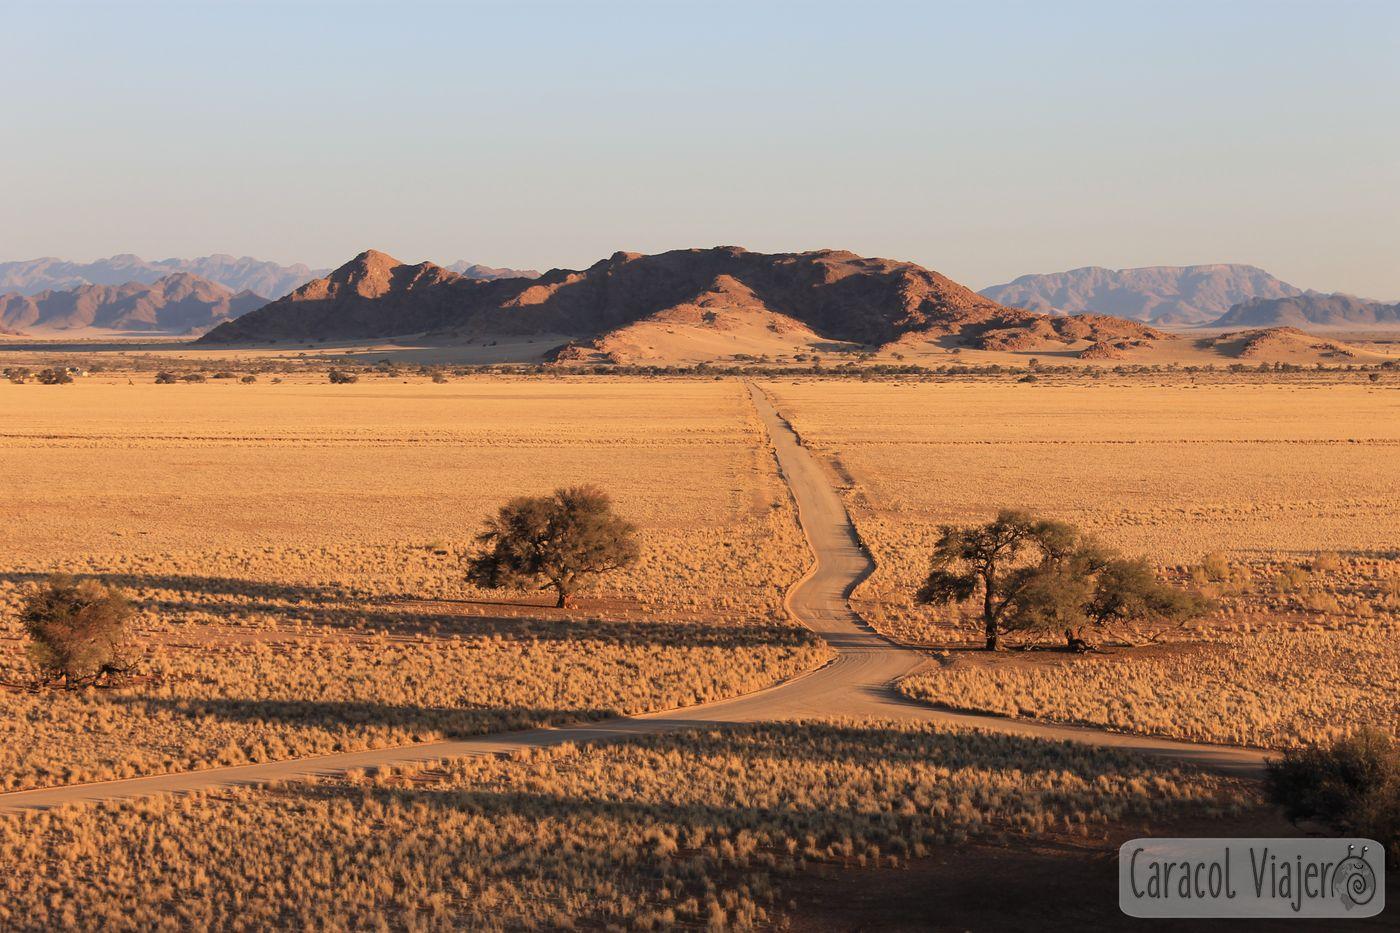 Sesriem desierto de Namibia y Valle de la Muerte